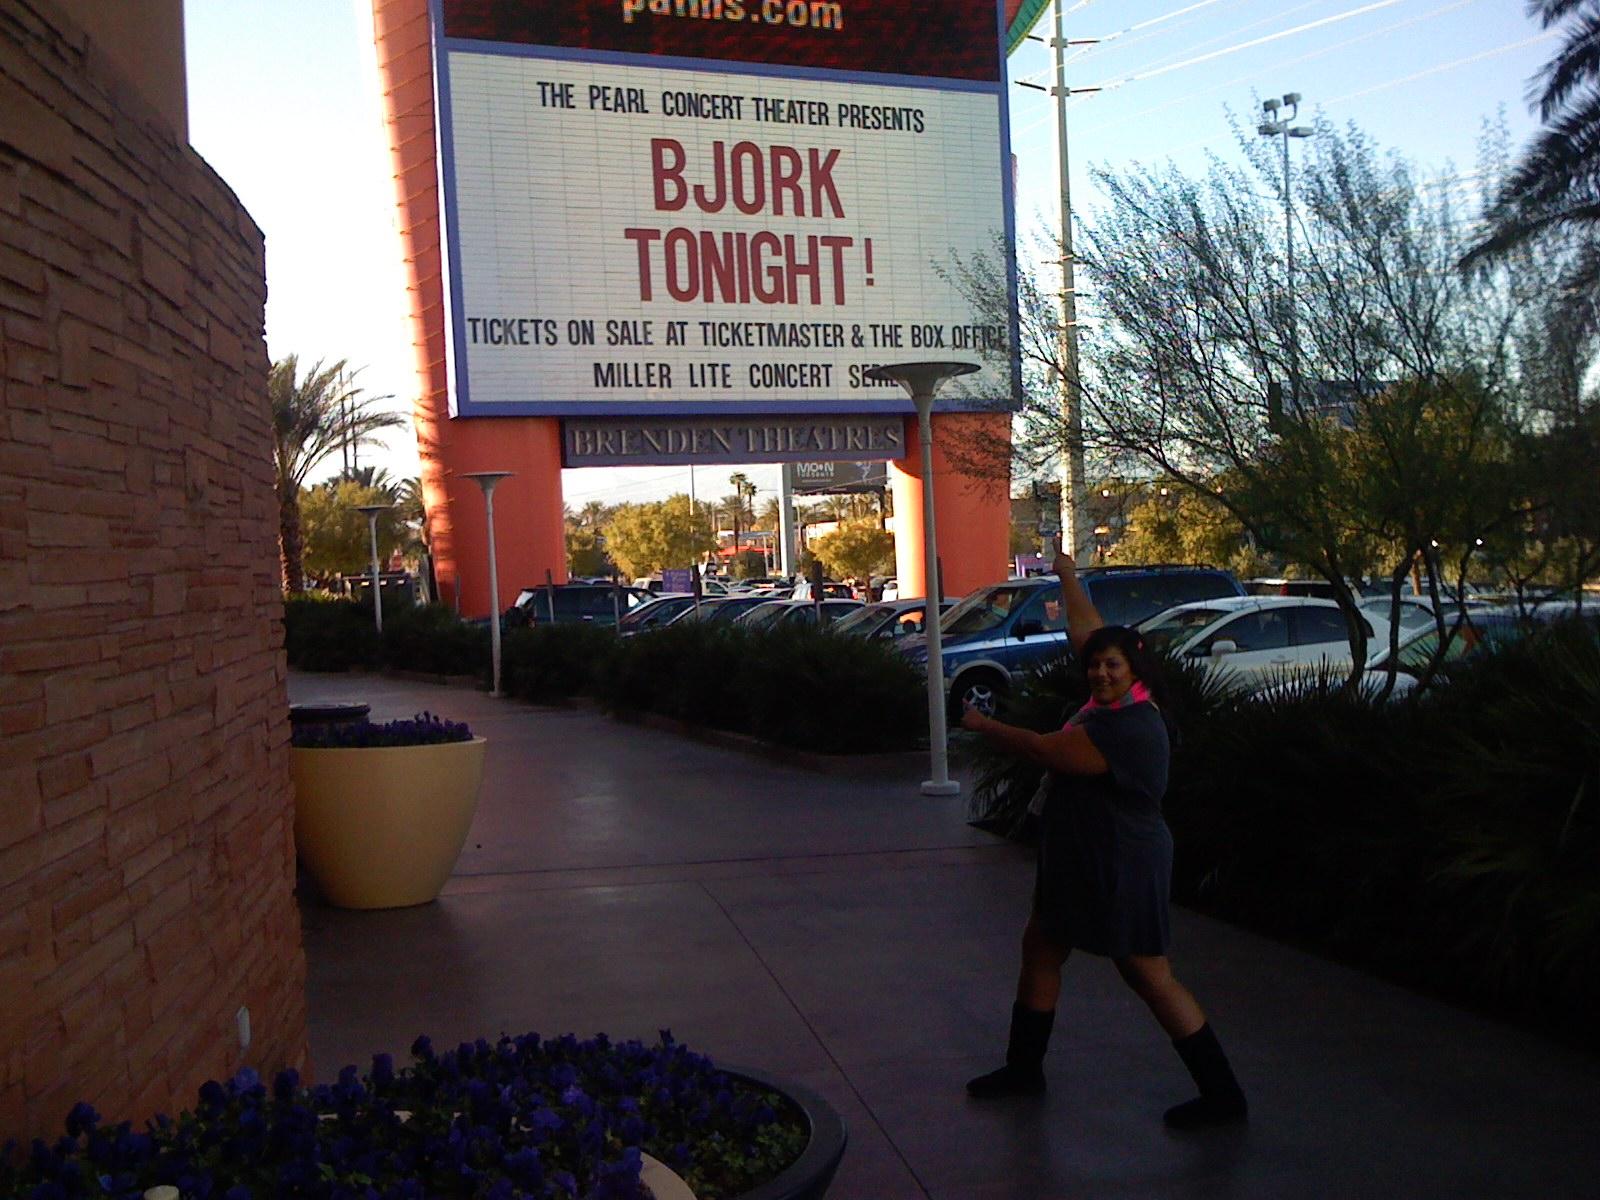 http://2.bp.blogspot.com/_Qn90qvGVEGM/TNSBYnBg9UI/AAAAAAAAGUo/NgxFOnaY4SE/s1600/Bjork+Las+Vegas+2007+(5).JPG